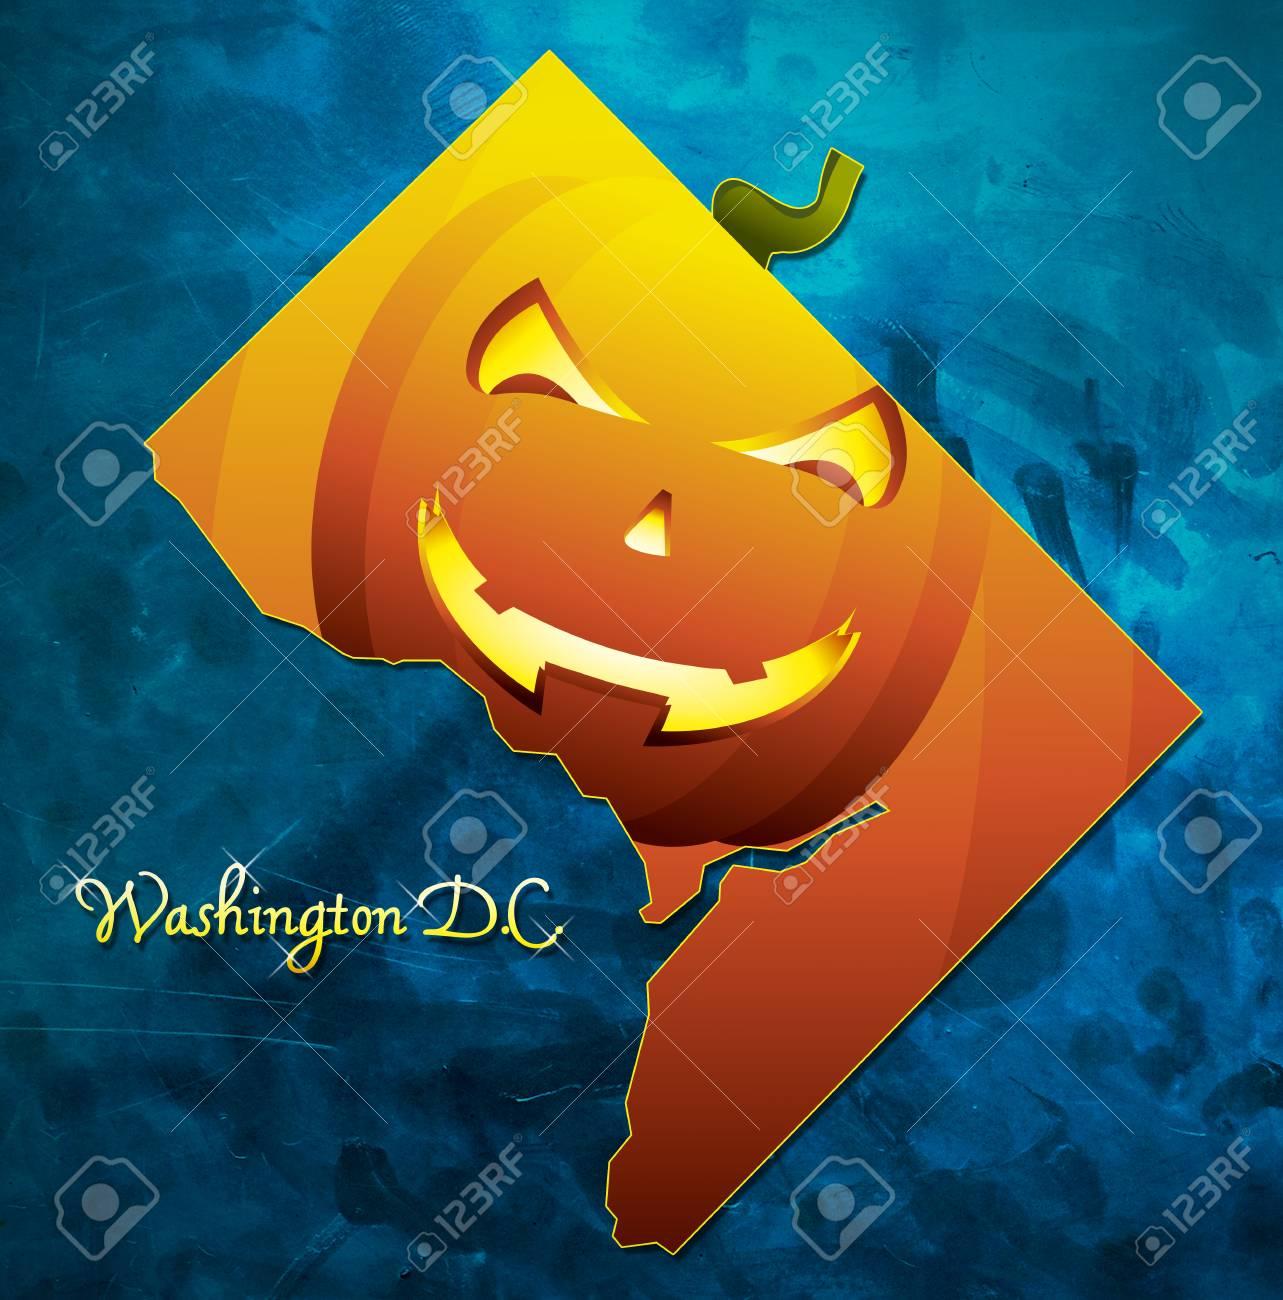 Washington DC State Map USA With Halloween Pumpkin Face Illustration ...